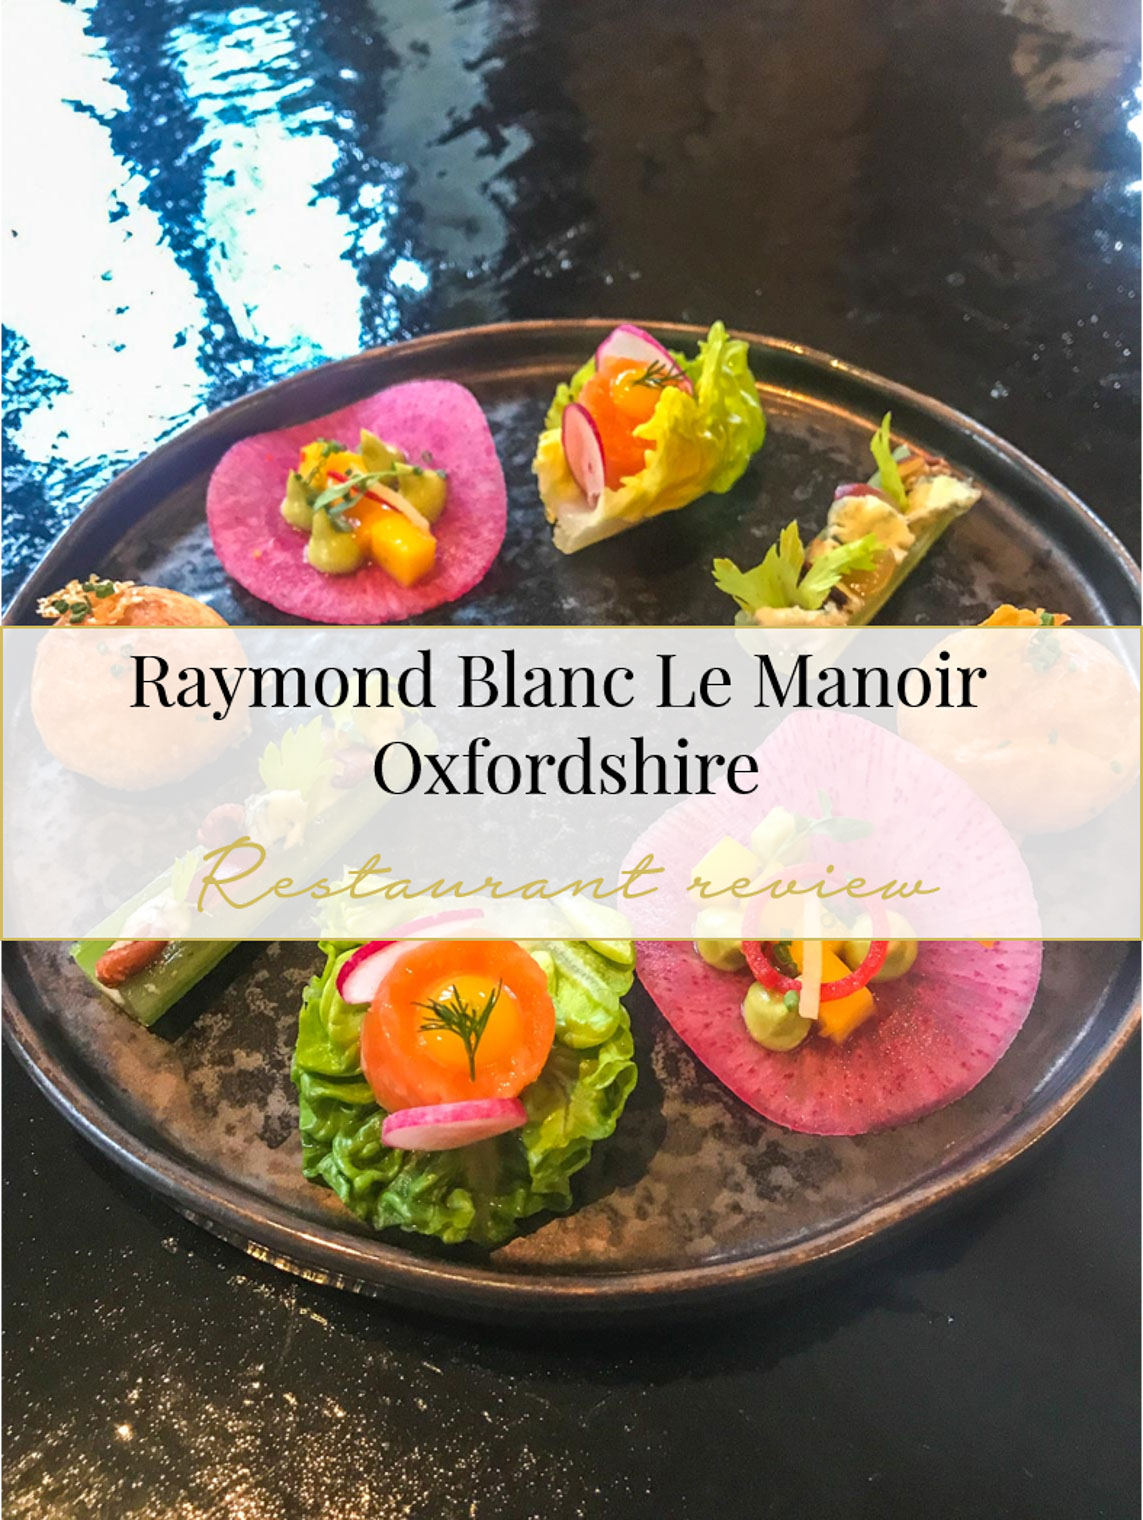 Raymond Blanc Le Manoir restaurant Oxfordshire review